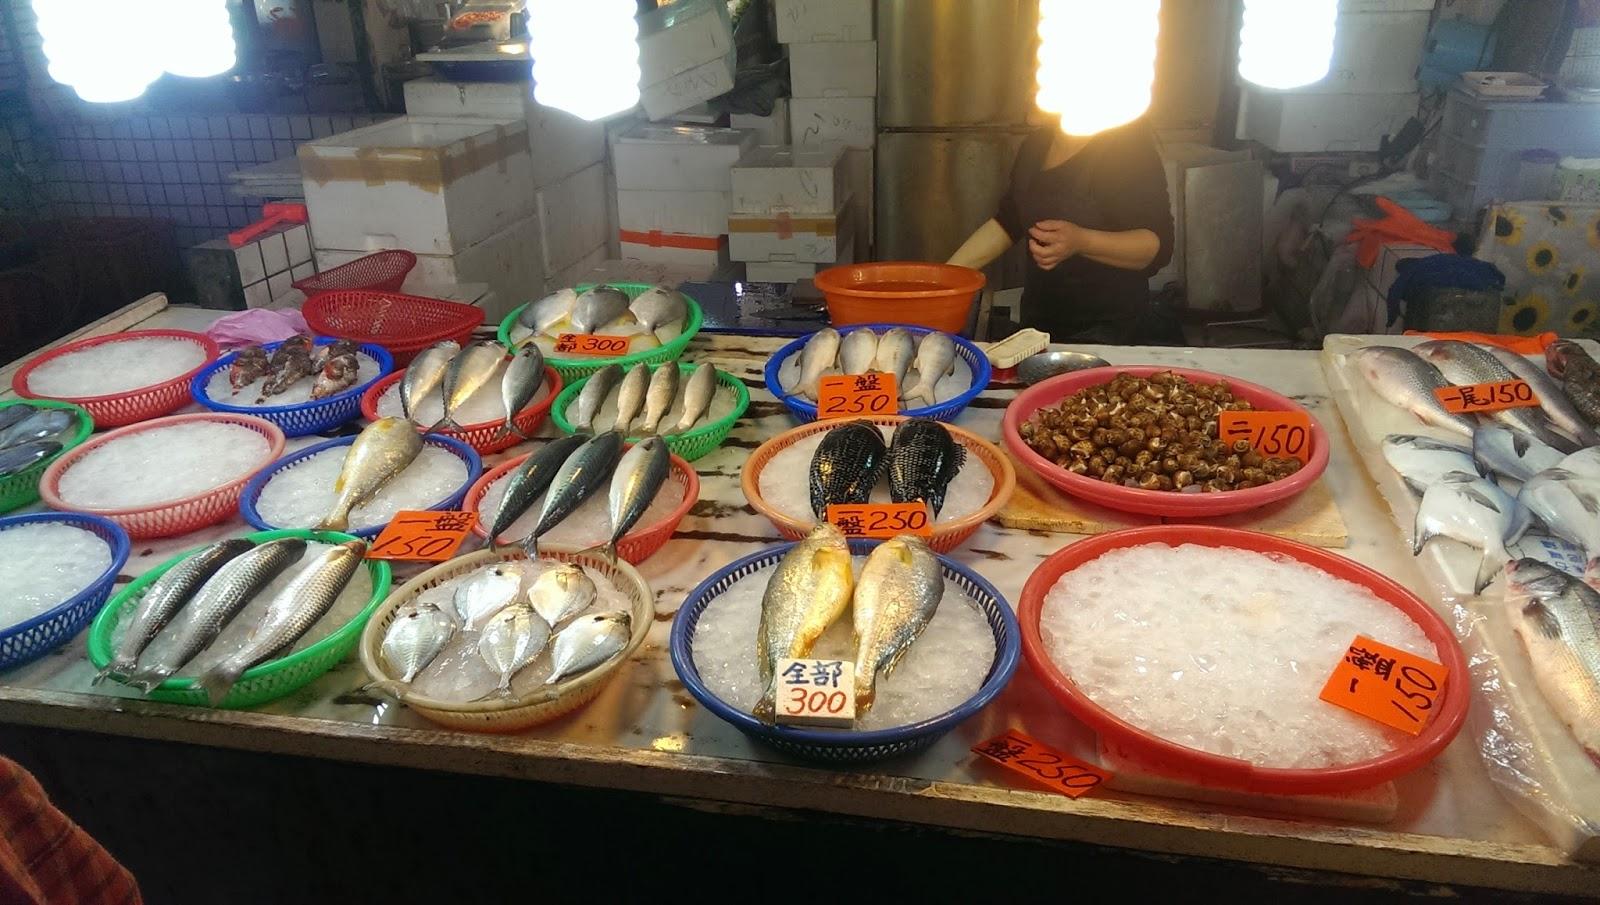 2015 02 02%2B12.54.09 - [食記] 葉家生魚片 - 布袋觀光漁市中的鮮魚餐廳